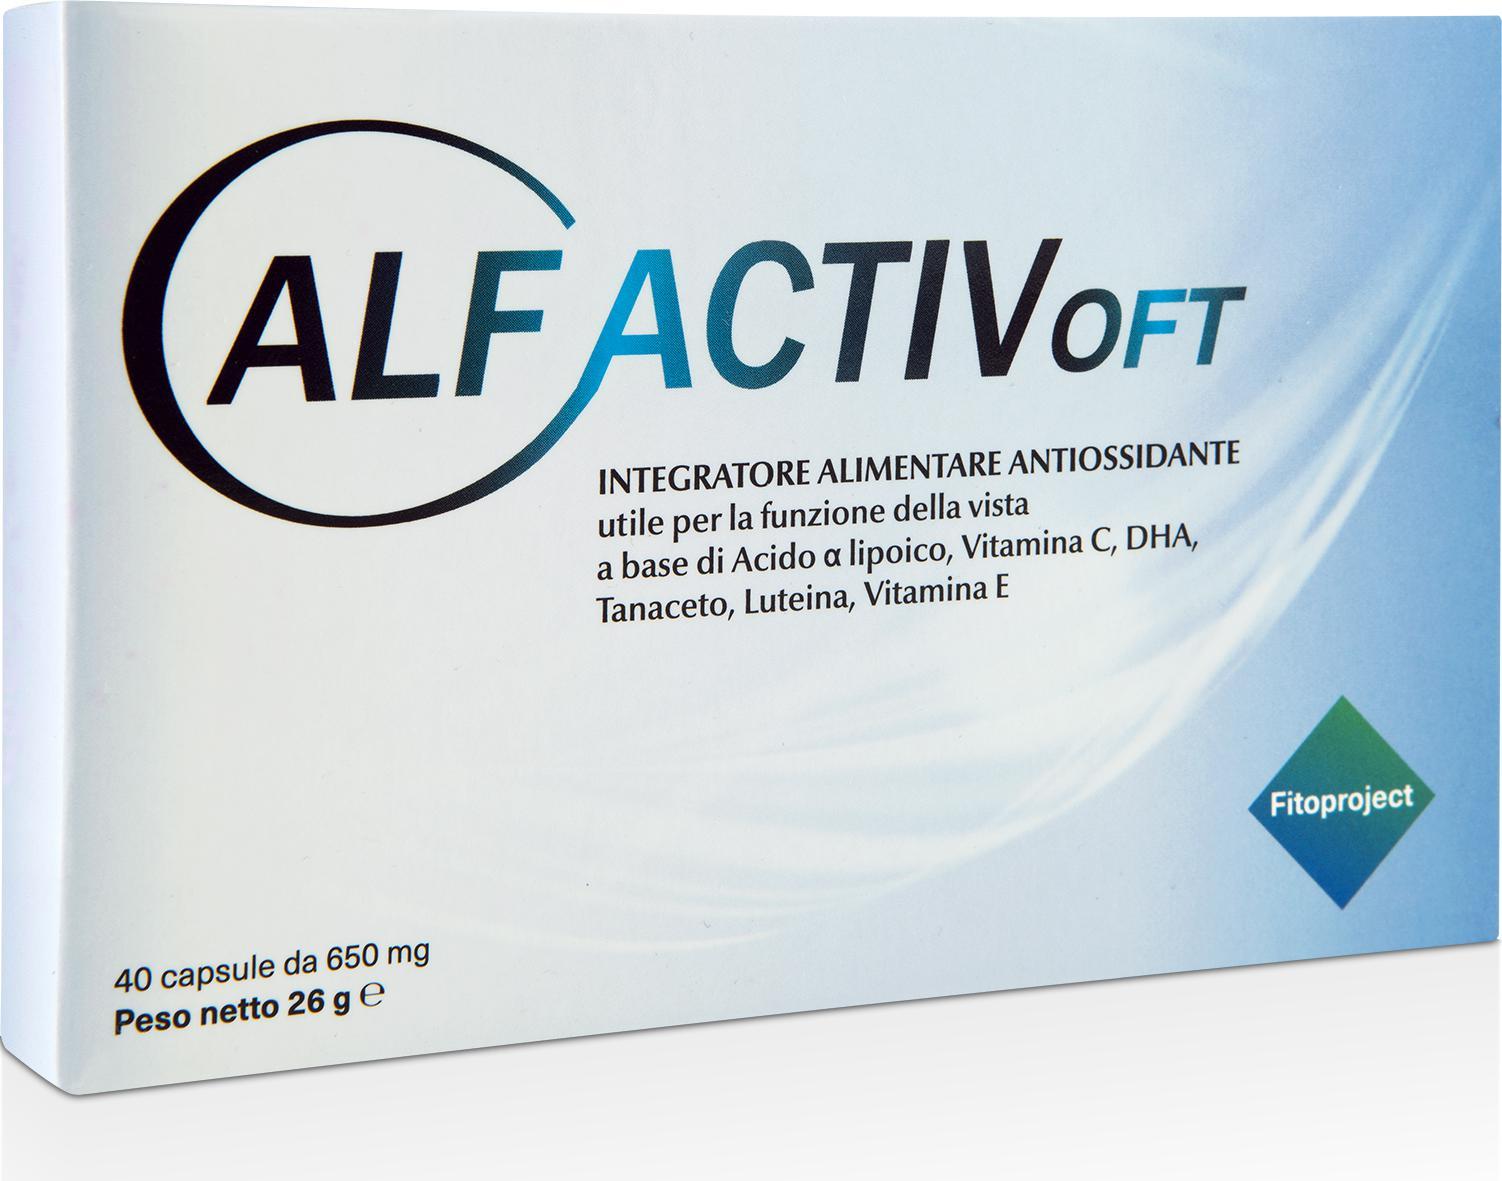 Alfactiv Oft 40 cps